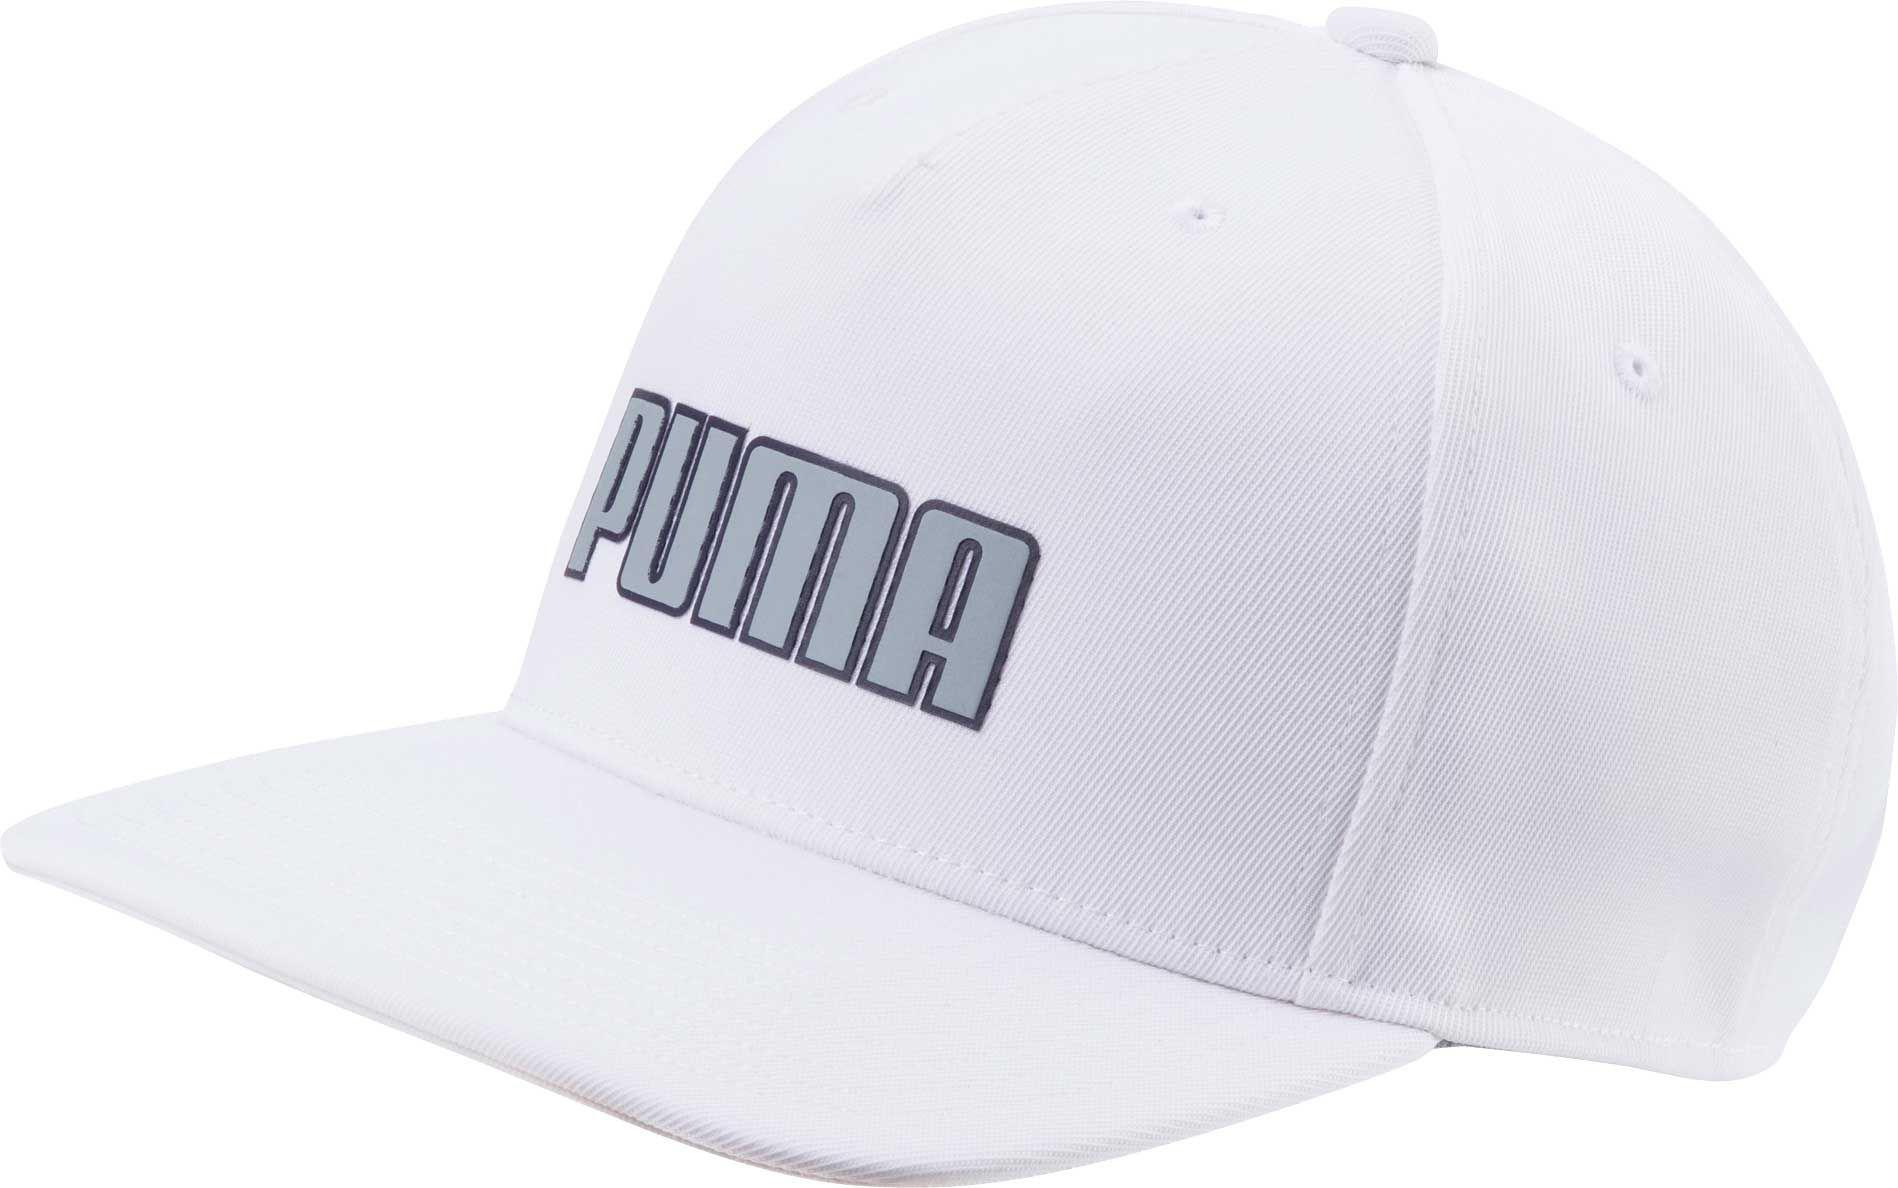 b62a9421bfa ... lyst 70a85 7e8a0 where to buy puma men monoline snapback golf hat white  black hats y97z7445 4845b 1834e ...